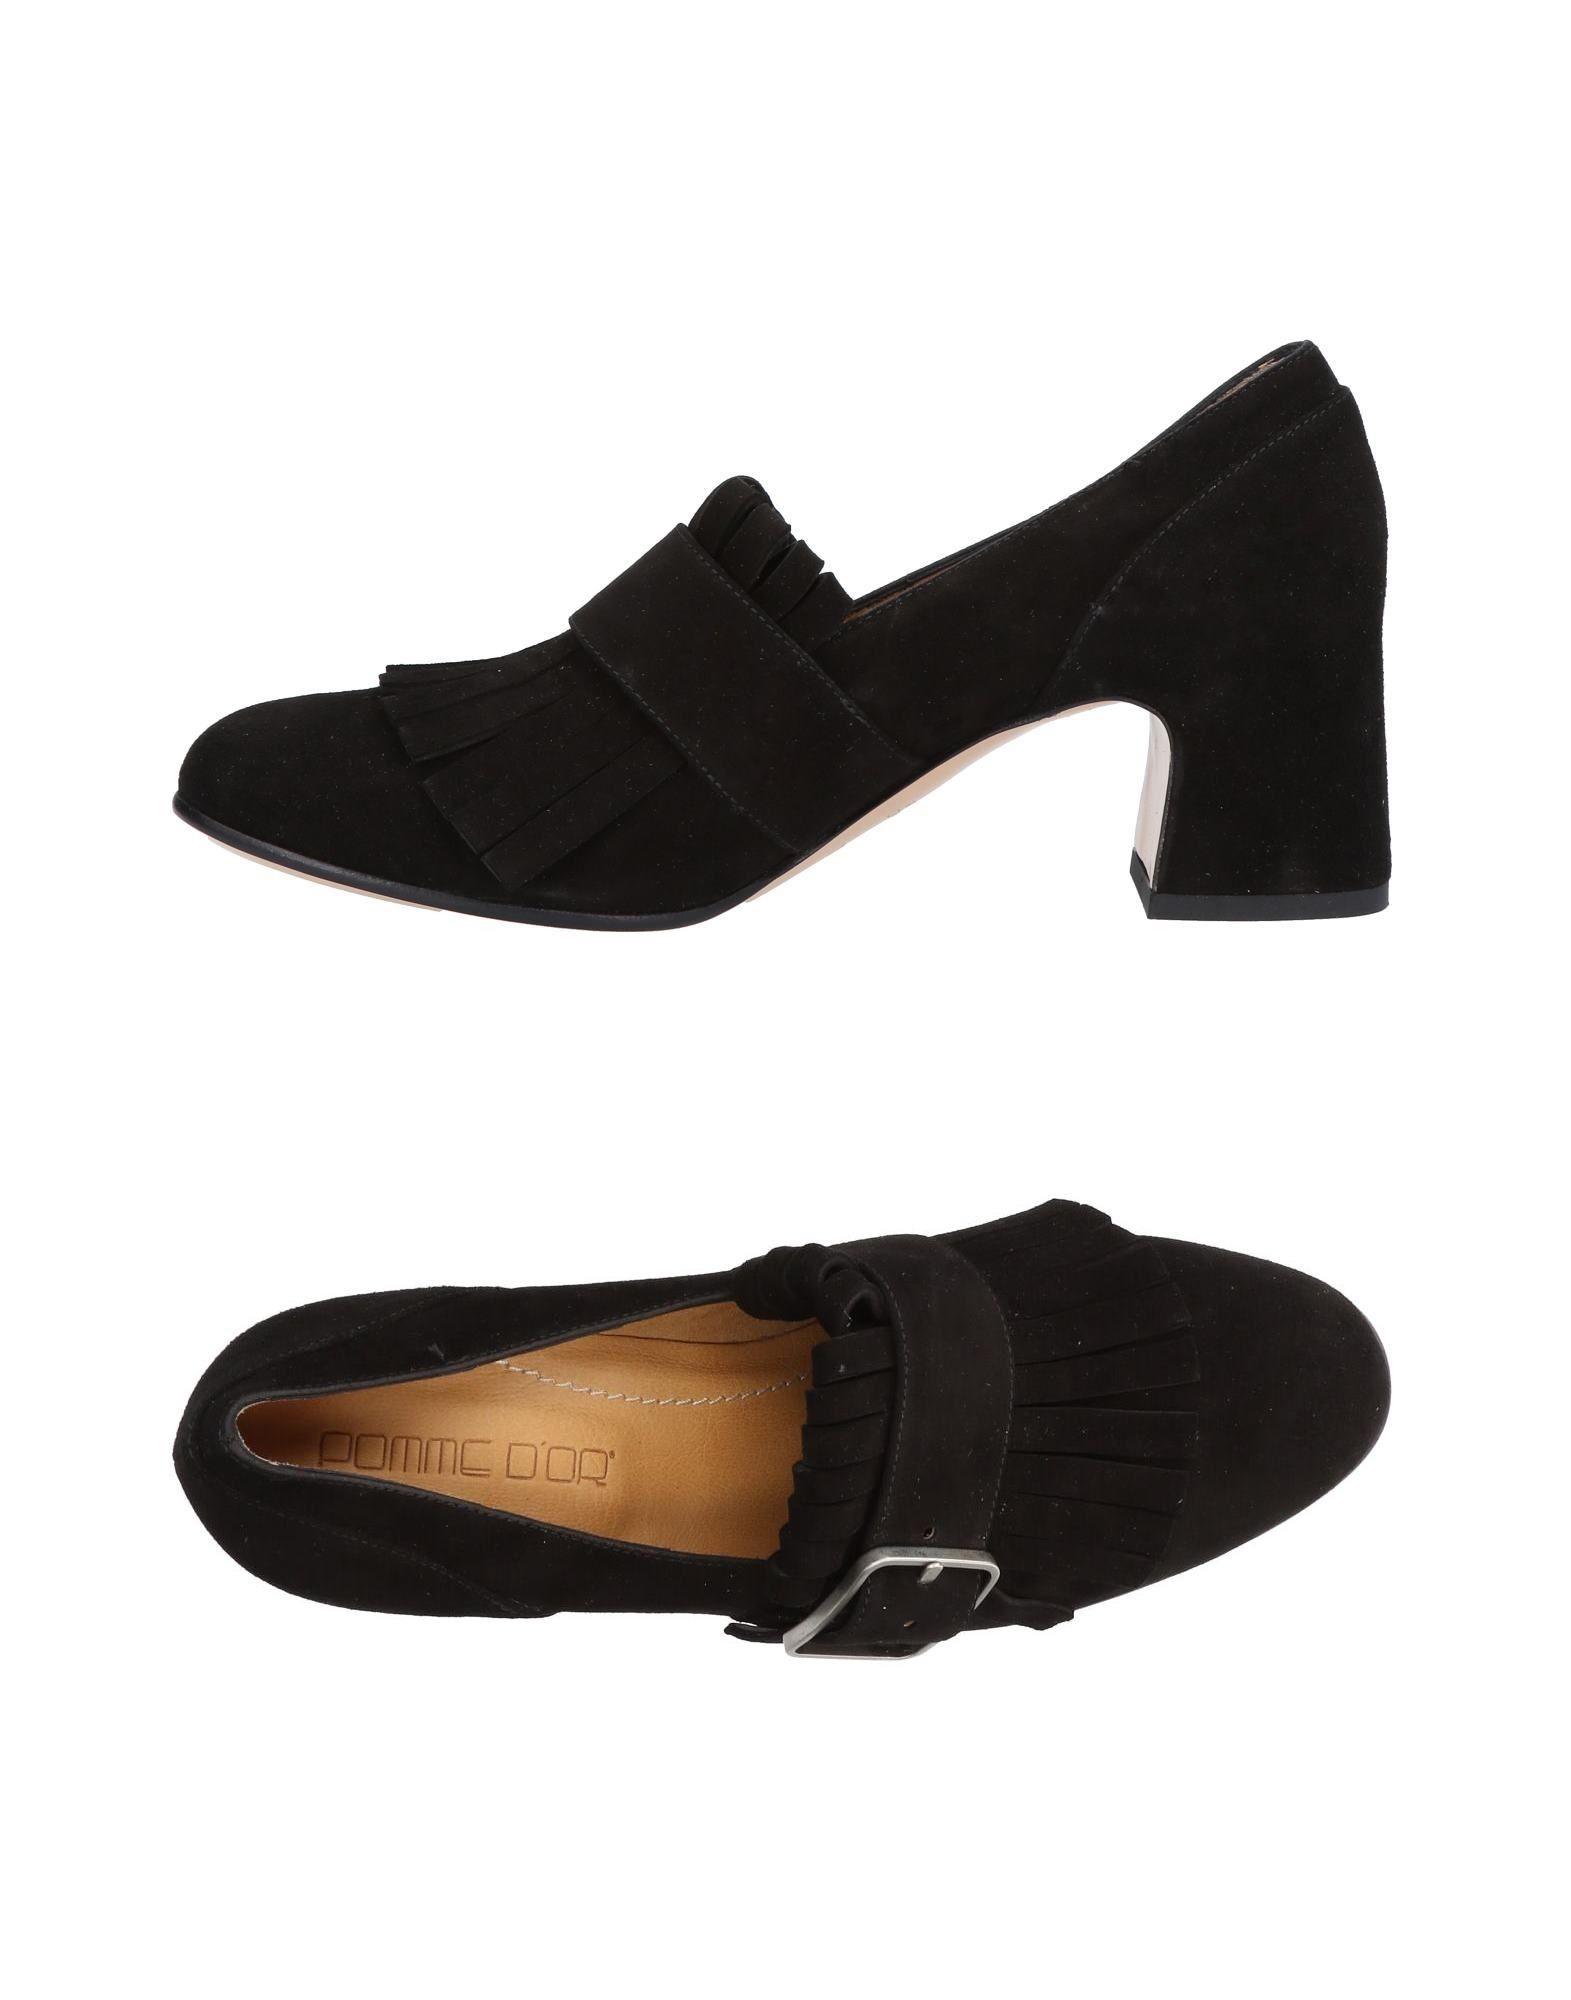 Pomme D'or Mokassins Damen  11482614KUGut aussehende strapazierfähige Schuhe